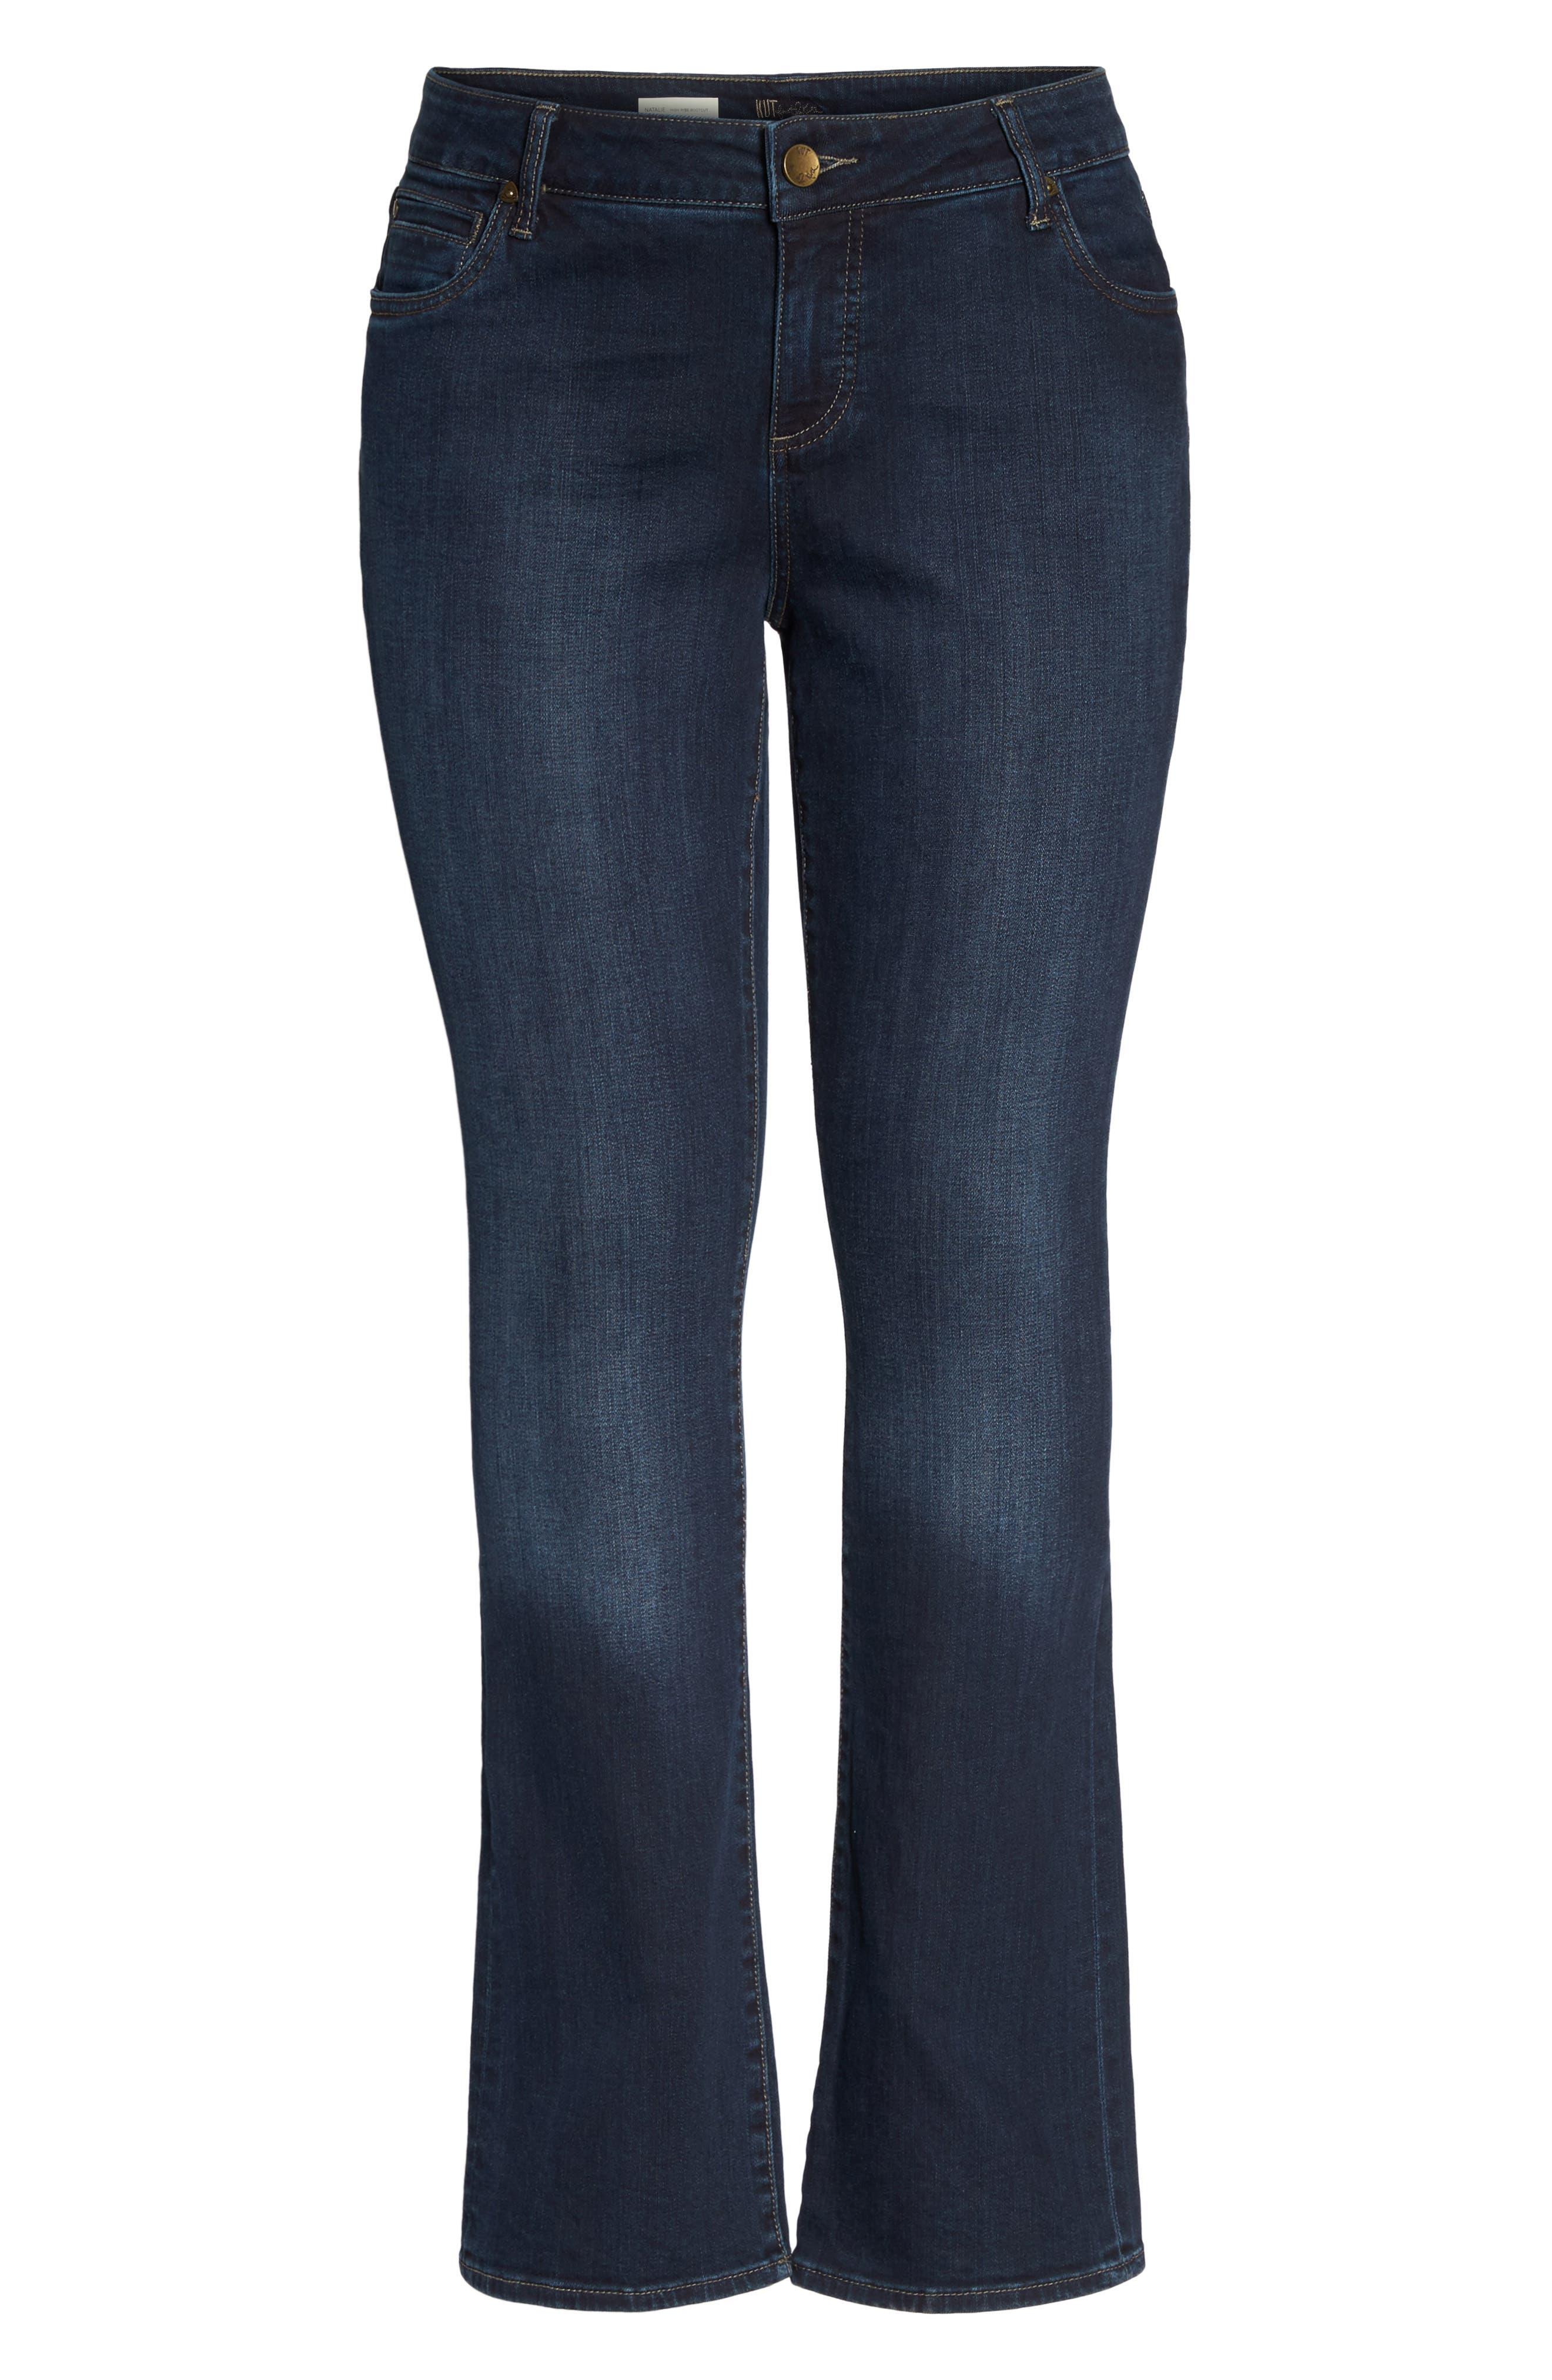 Natalie High Waist Bootcut Jeans,                             Alternate thumbnail 6, color,                             453